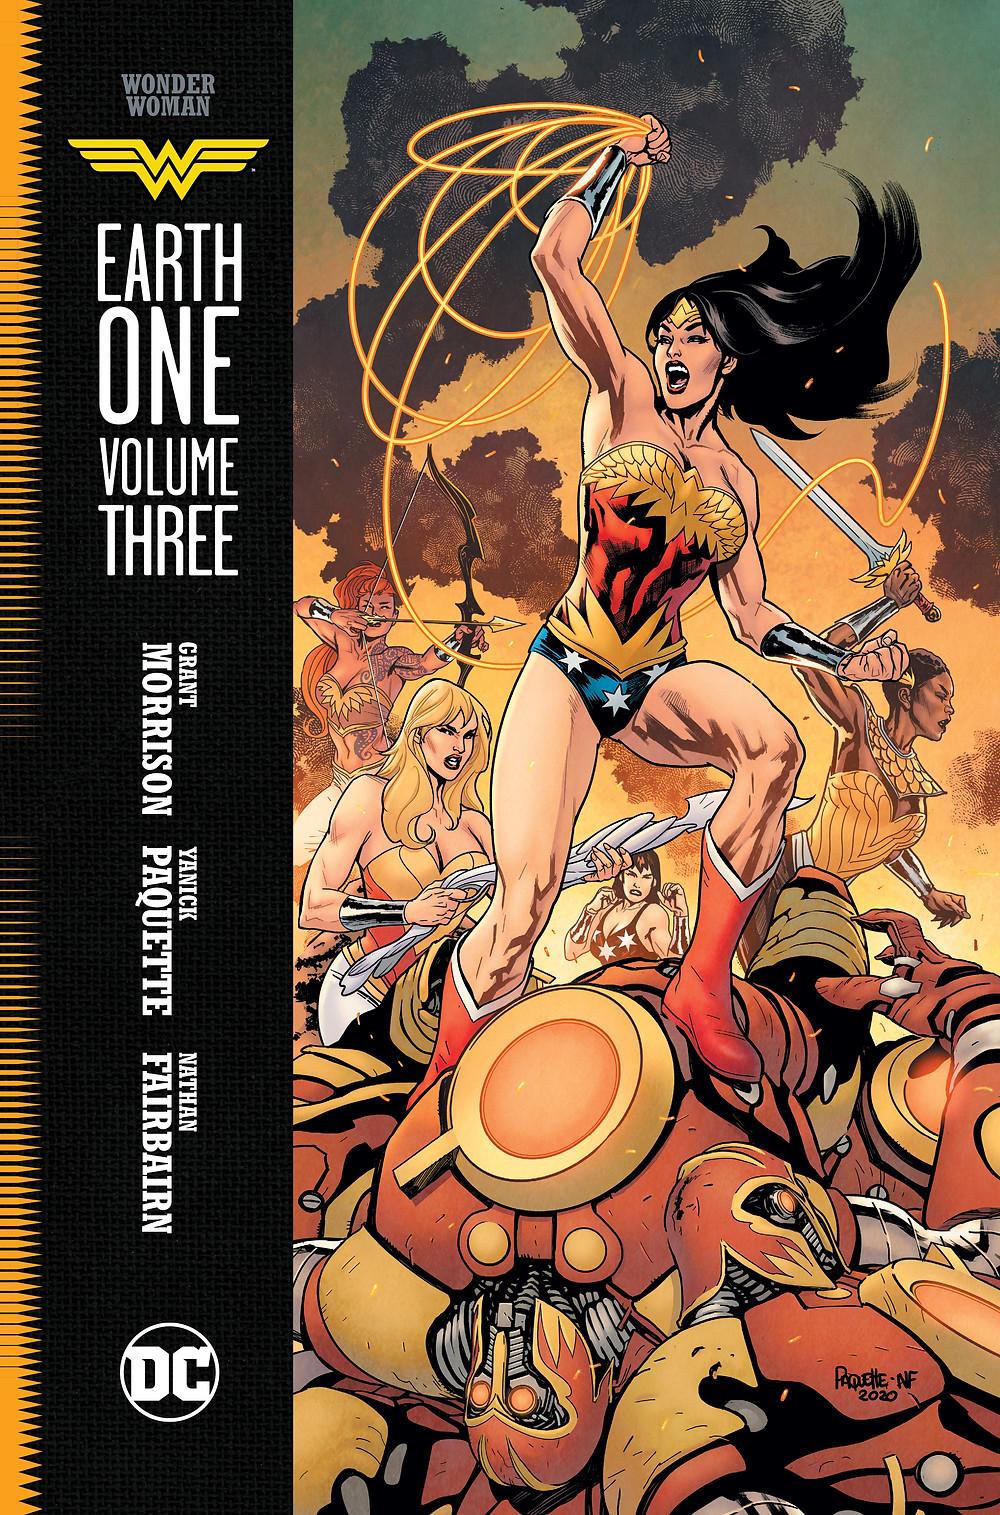 Wonder Woman: Earth One Cilt 3